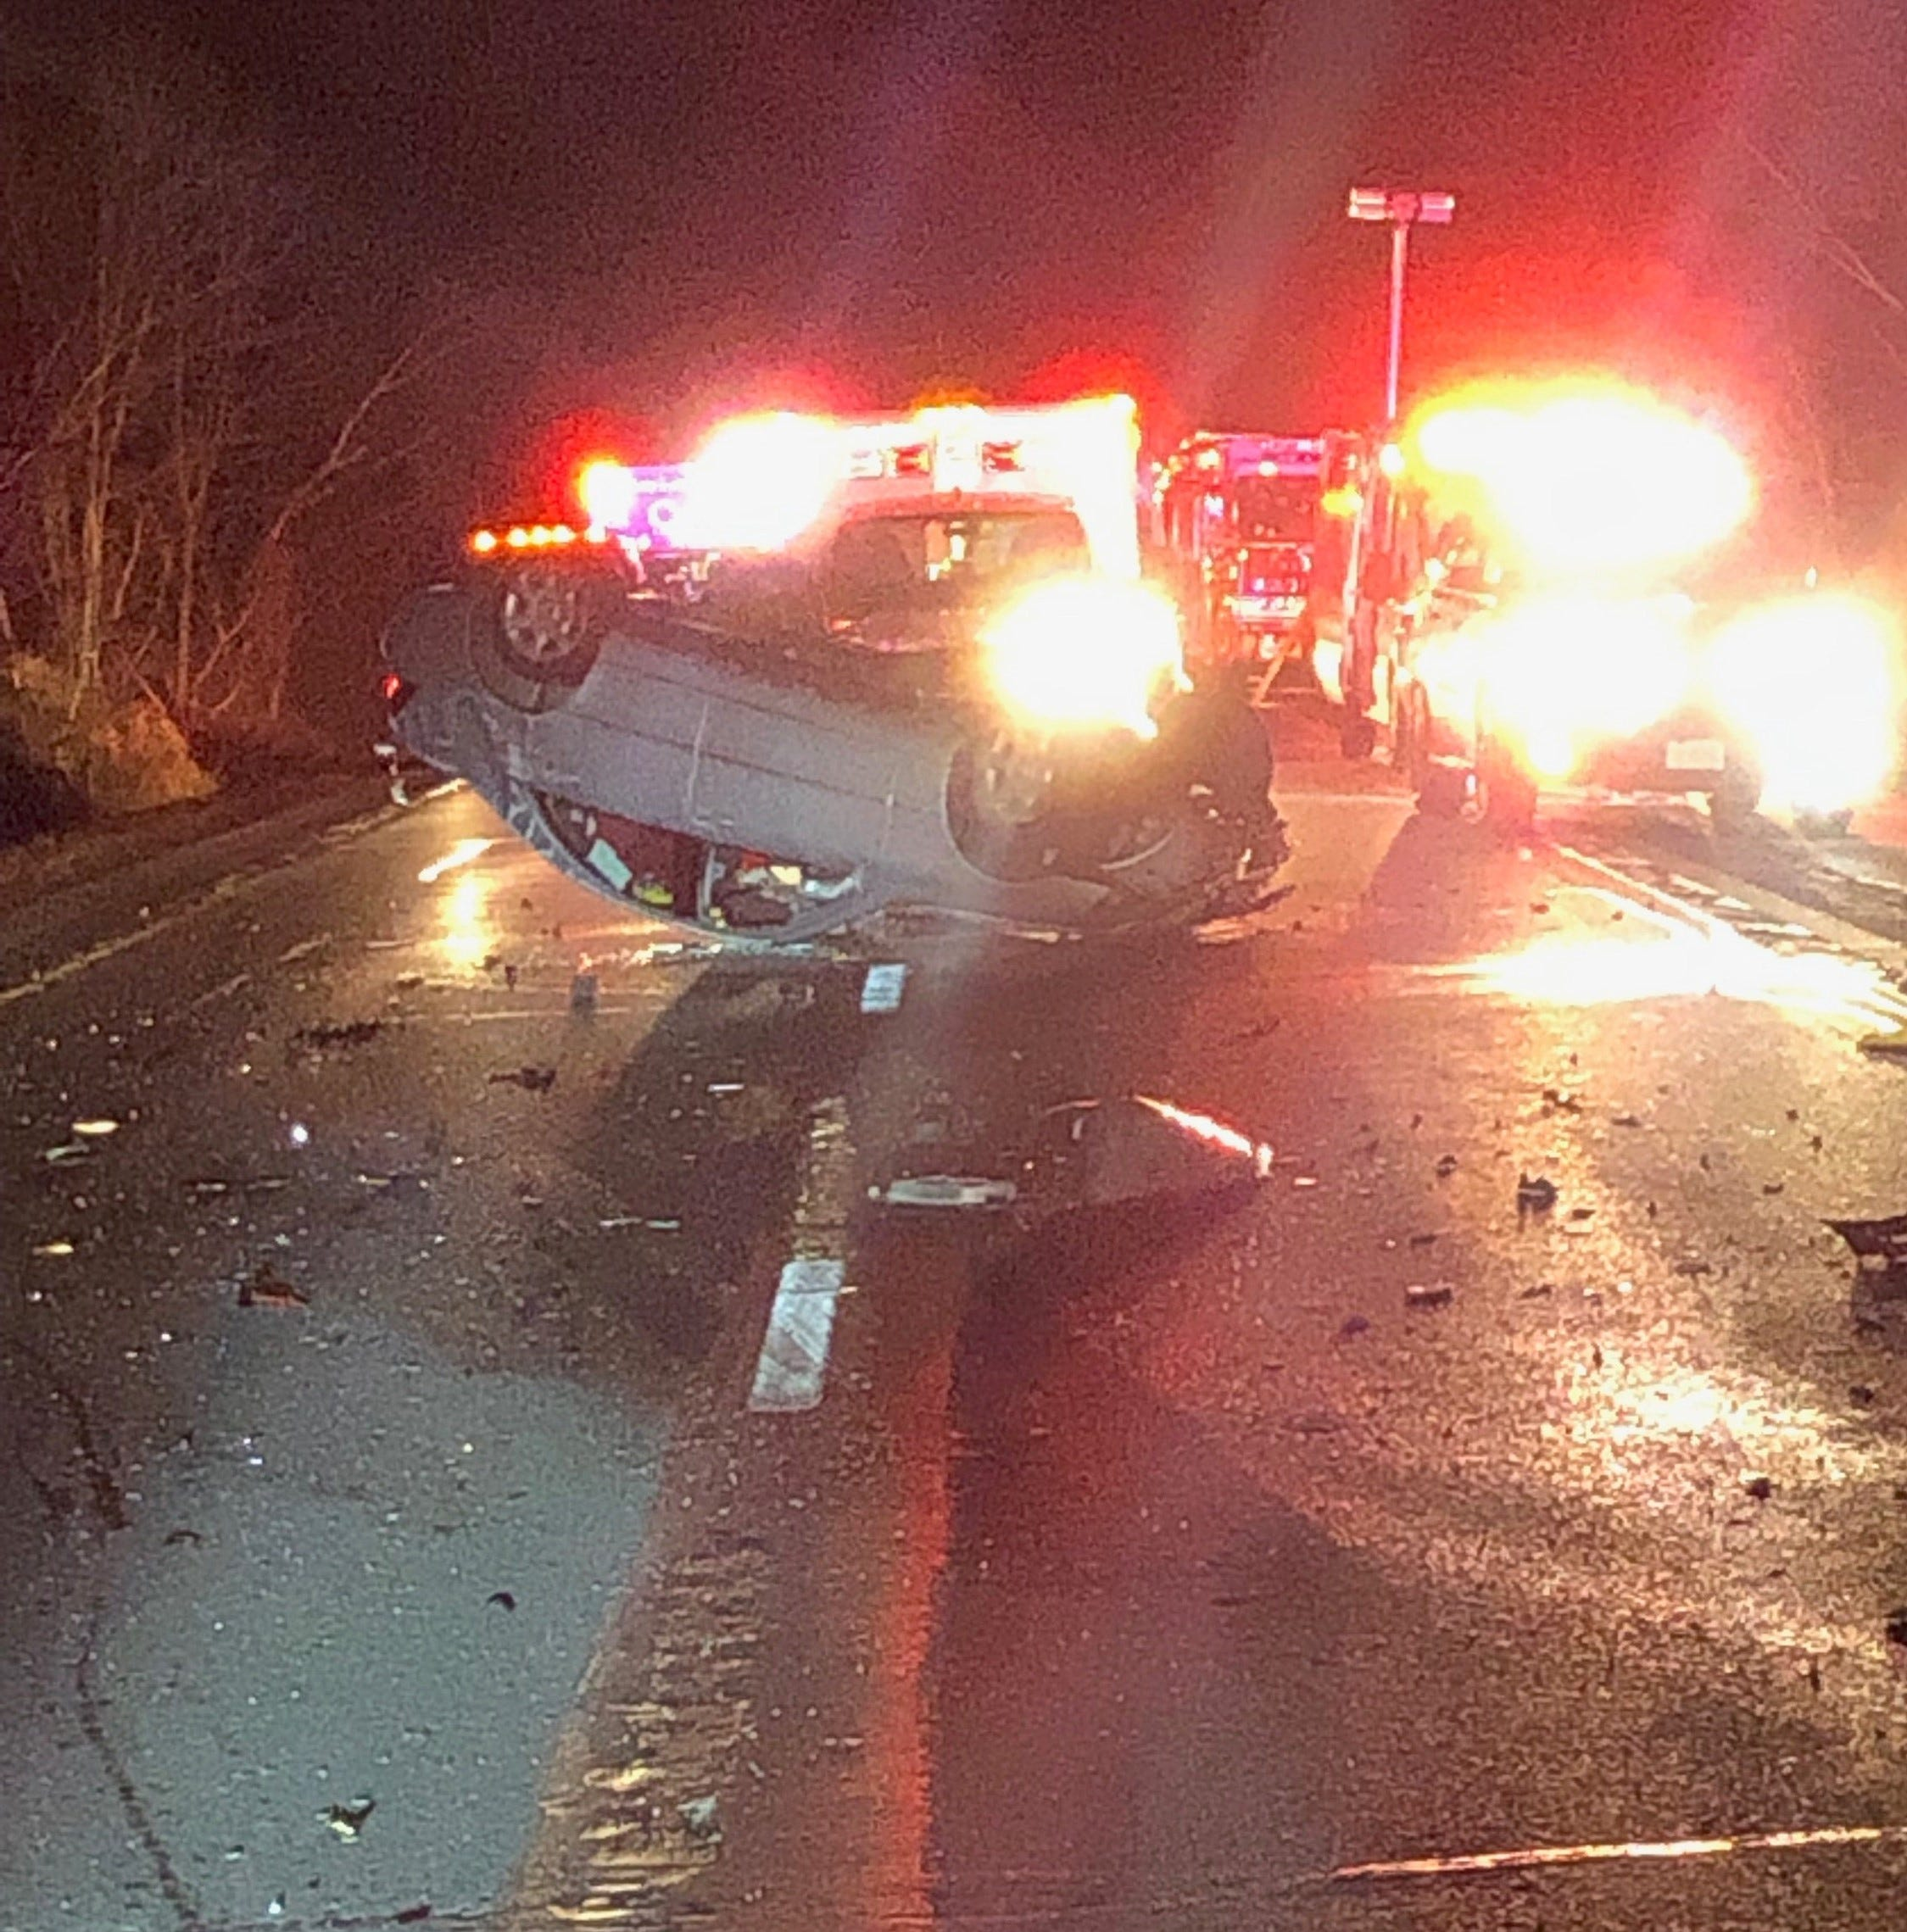 Police investigating multi-vehicle crash on I-84 east in Kent